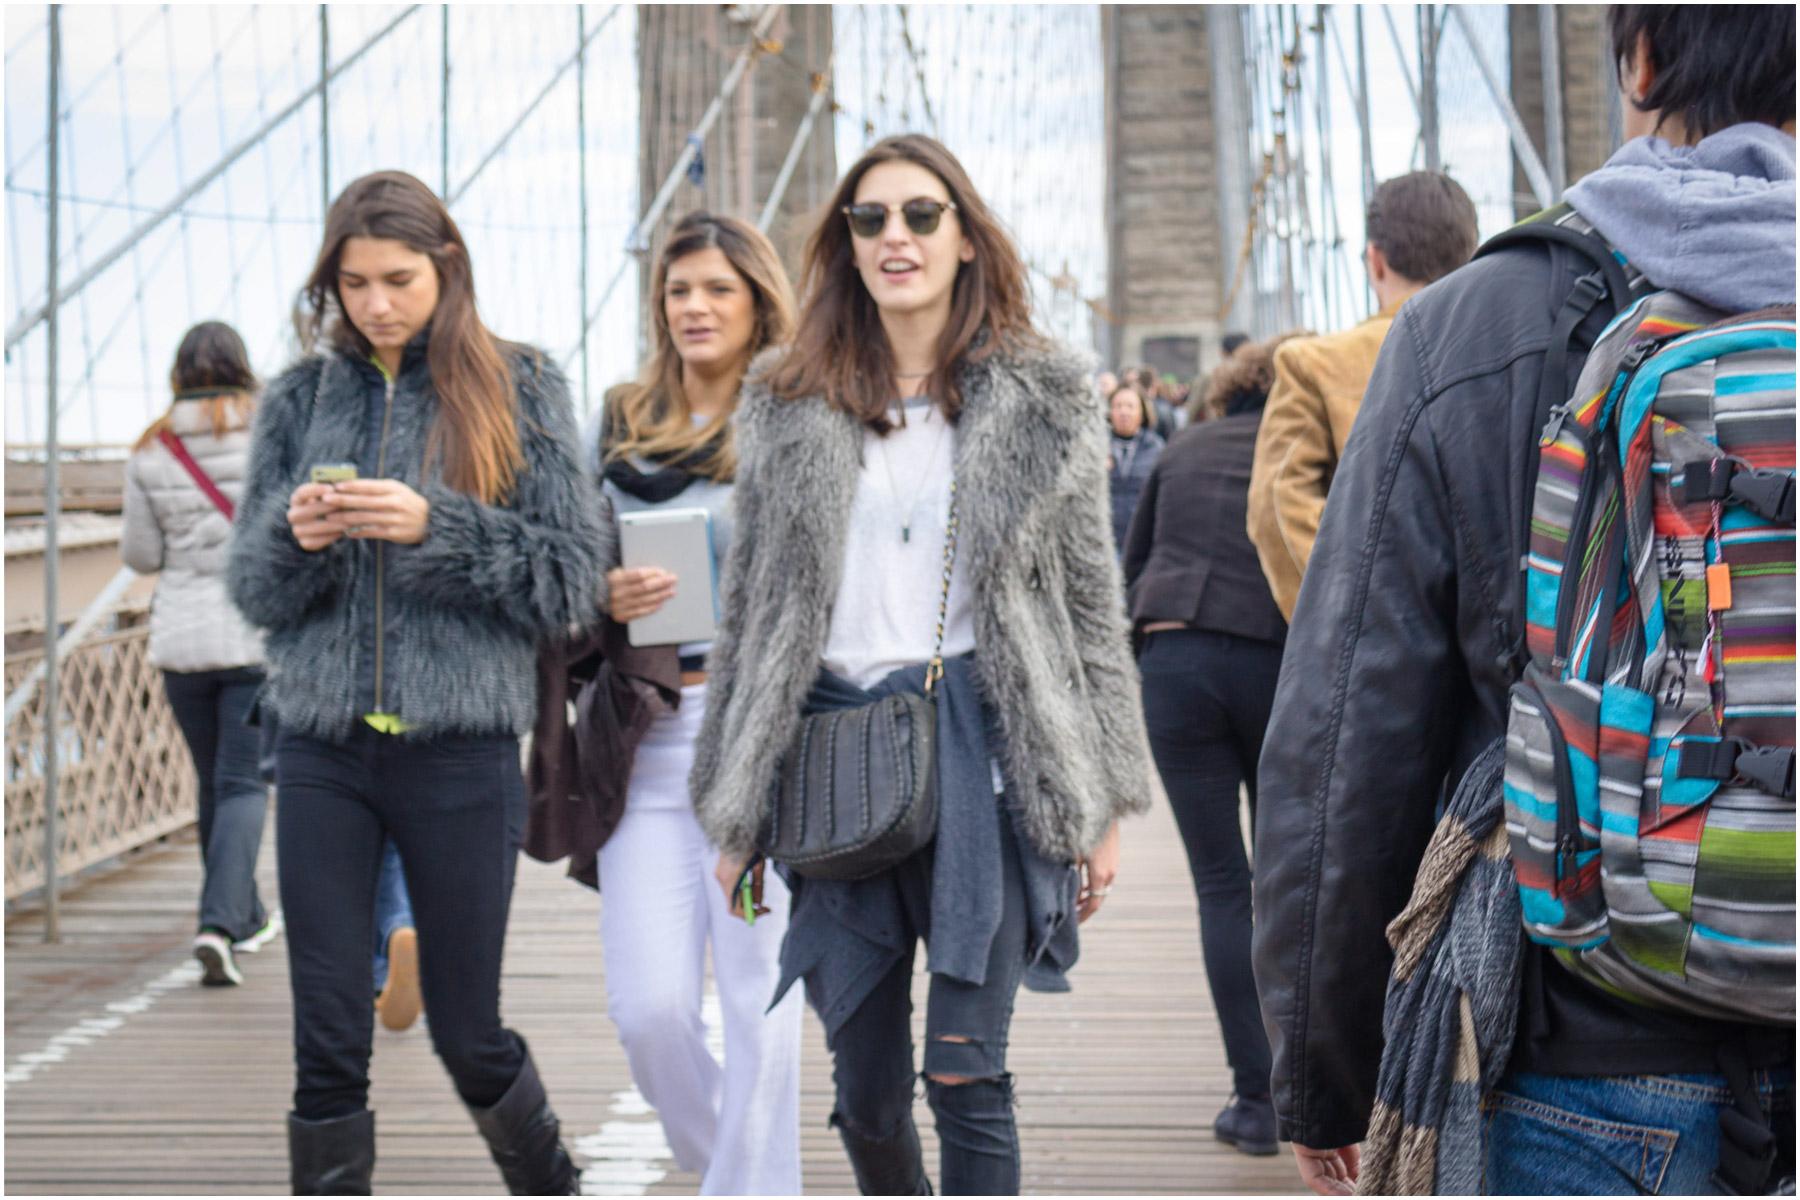 Crossing-the-Brooklyn-Bridge_4.jpg